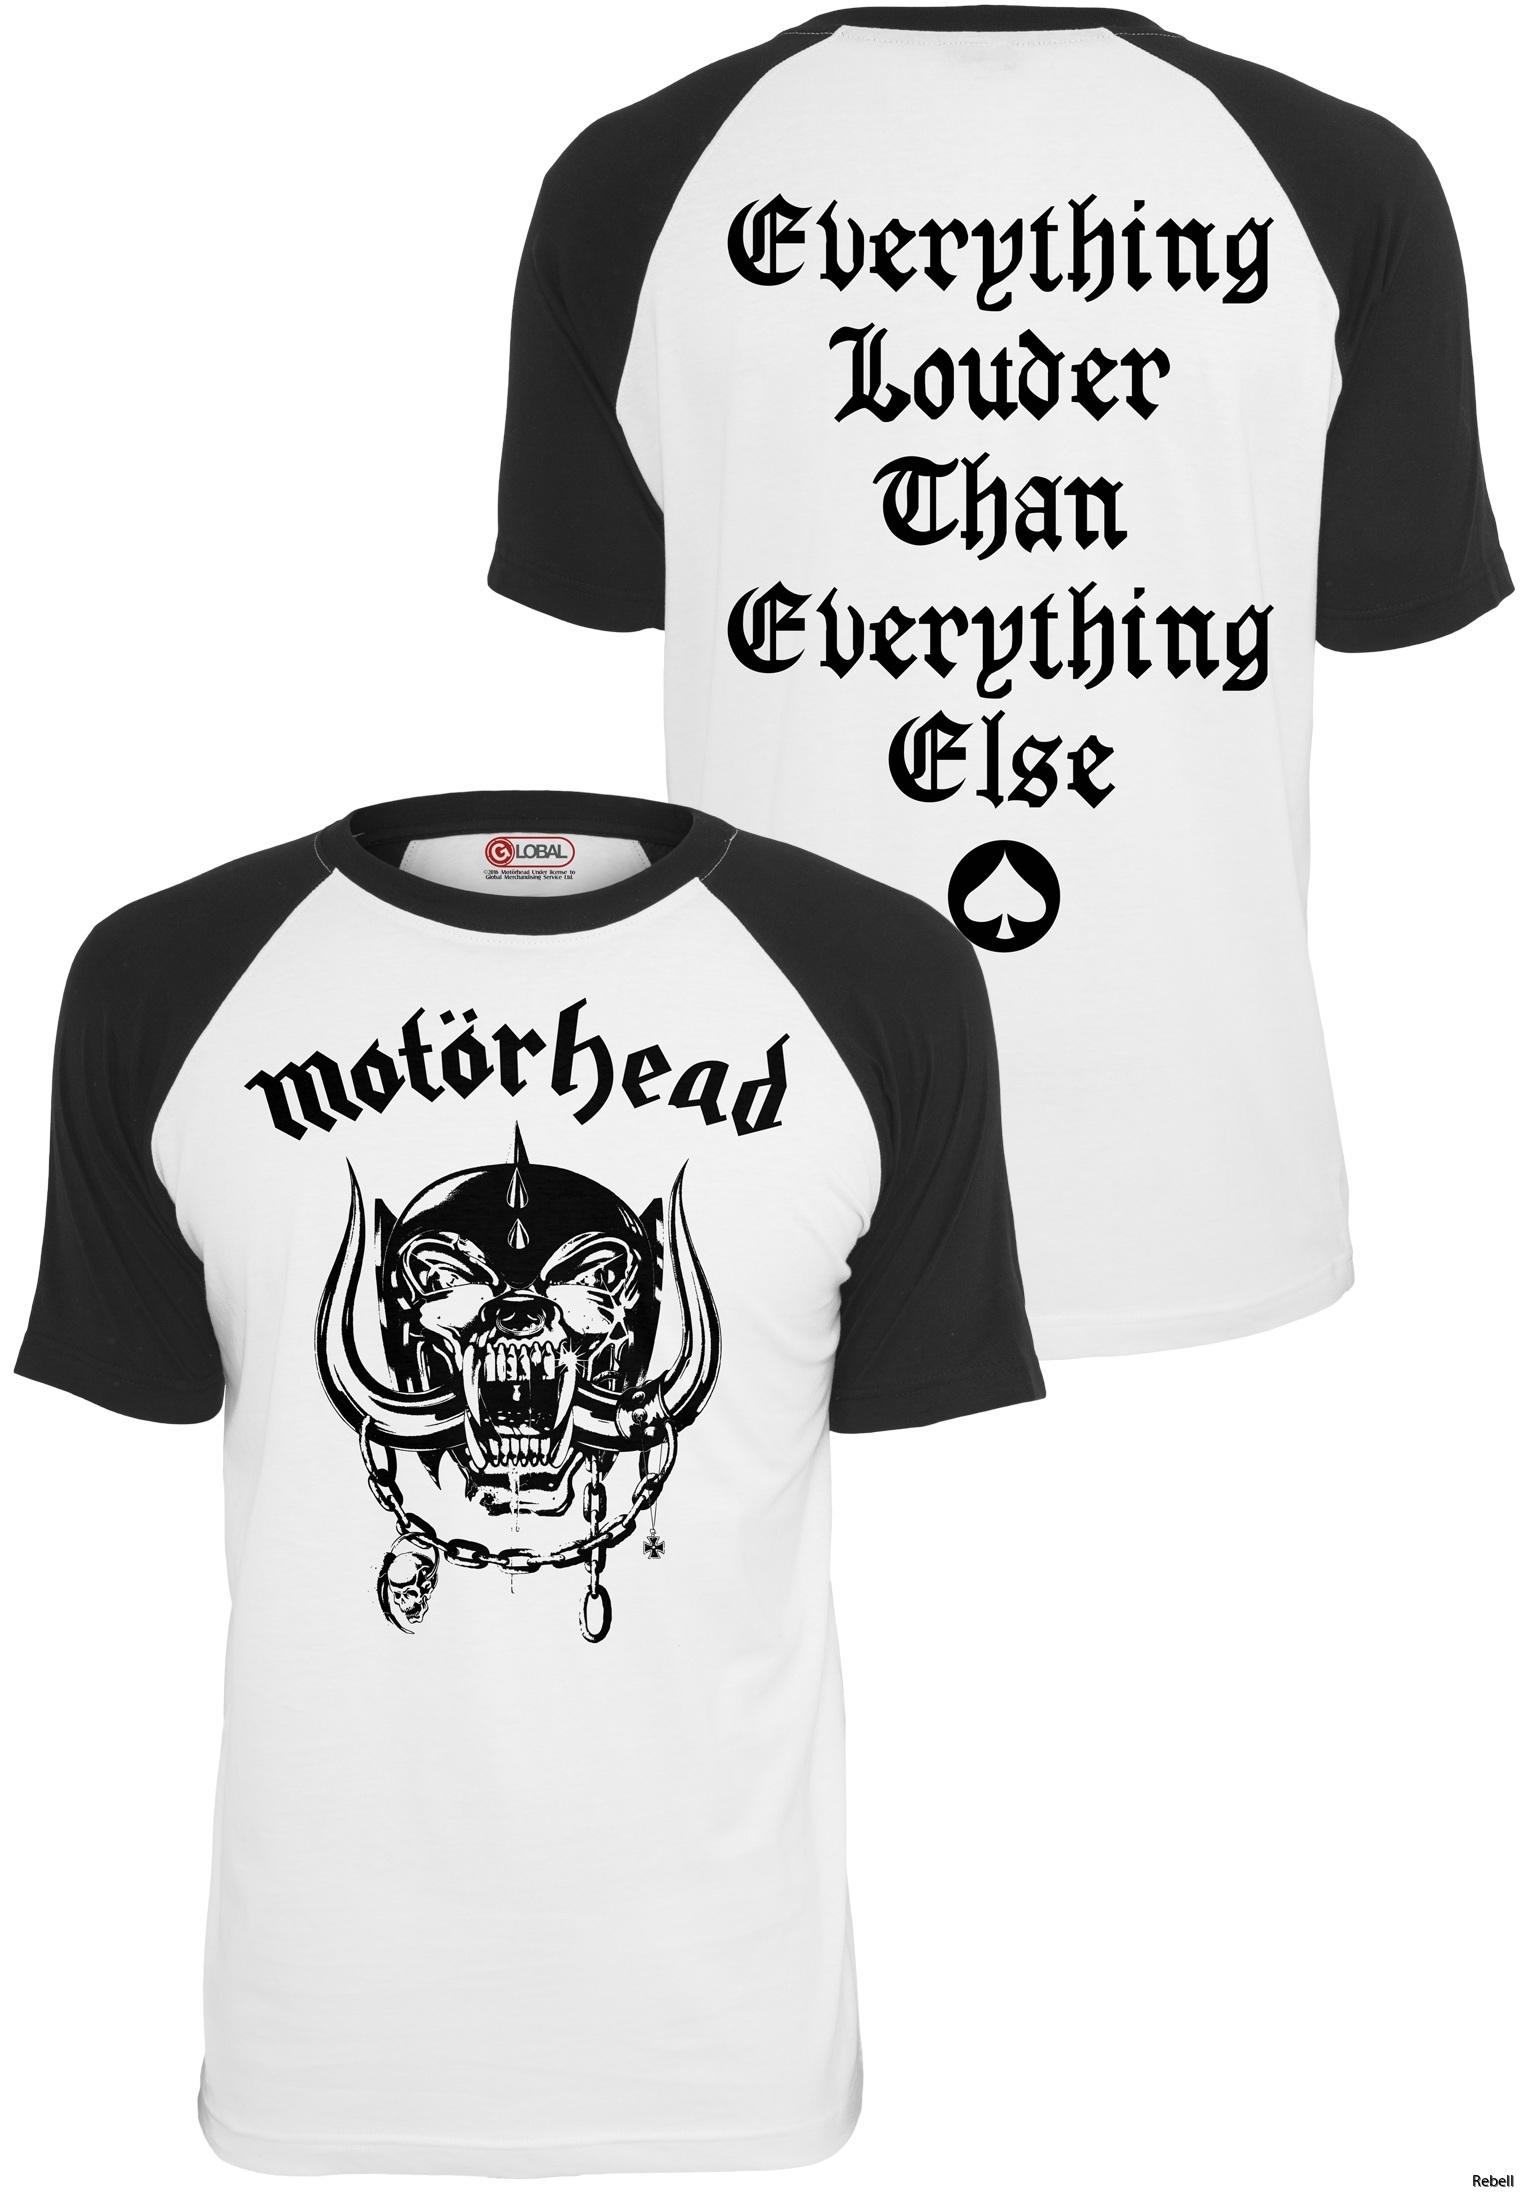 motorhead motörhead rock merch band rockstar